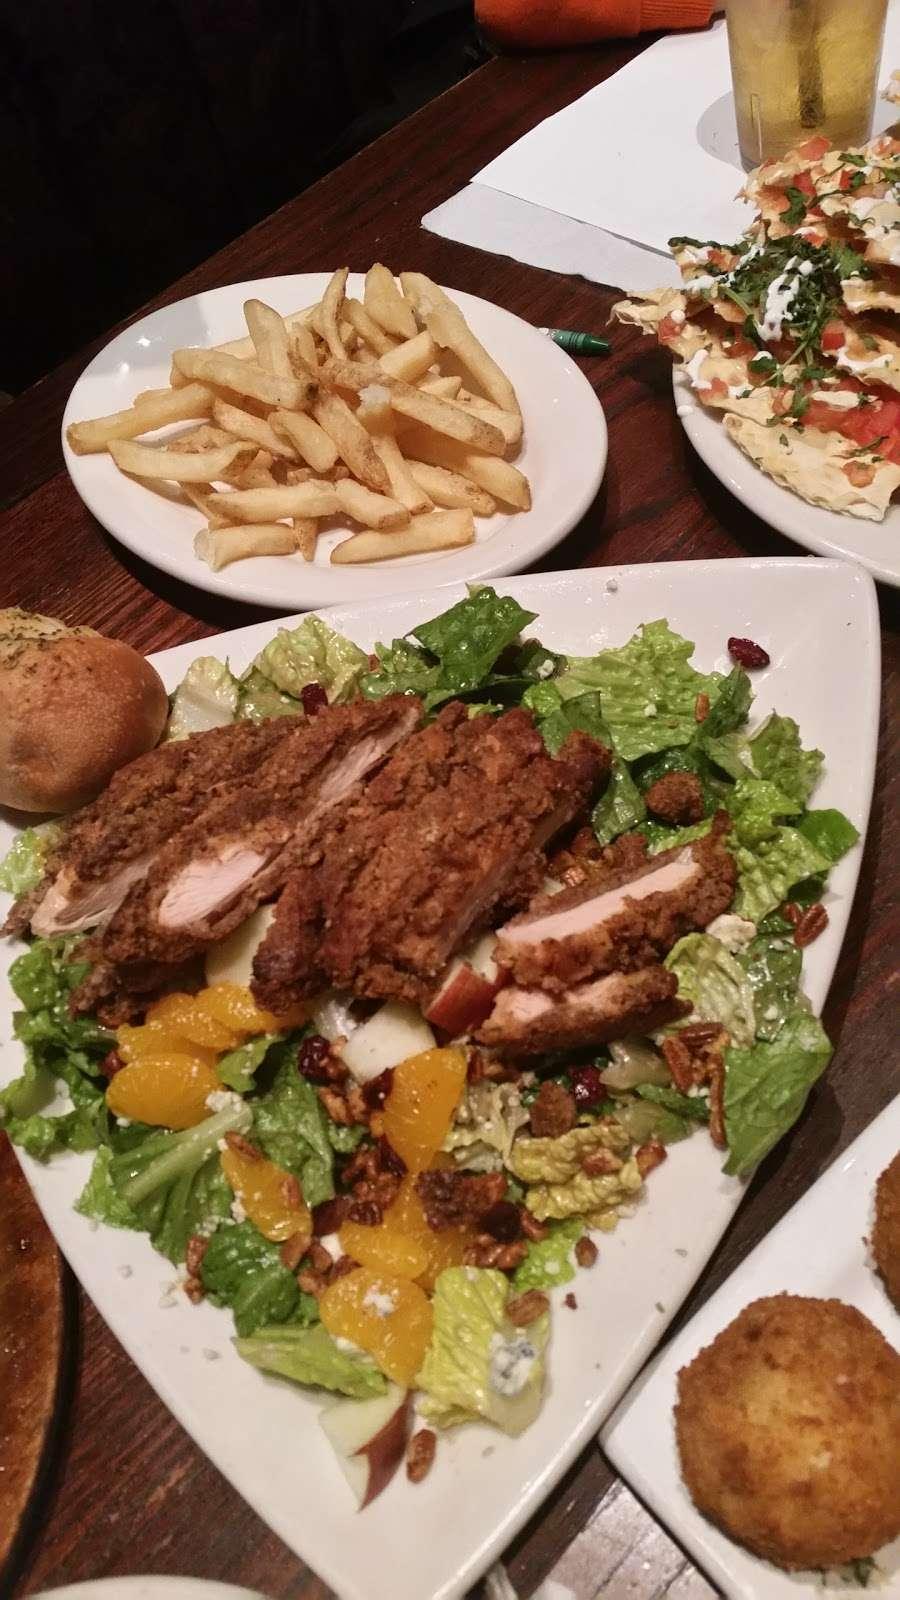 Houlihans - restaurant  | Photo 10 of 10 | Address: 151 Lefante Way, Bayonne, NJ 07002, USA | Phone: (201) 858-0400